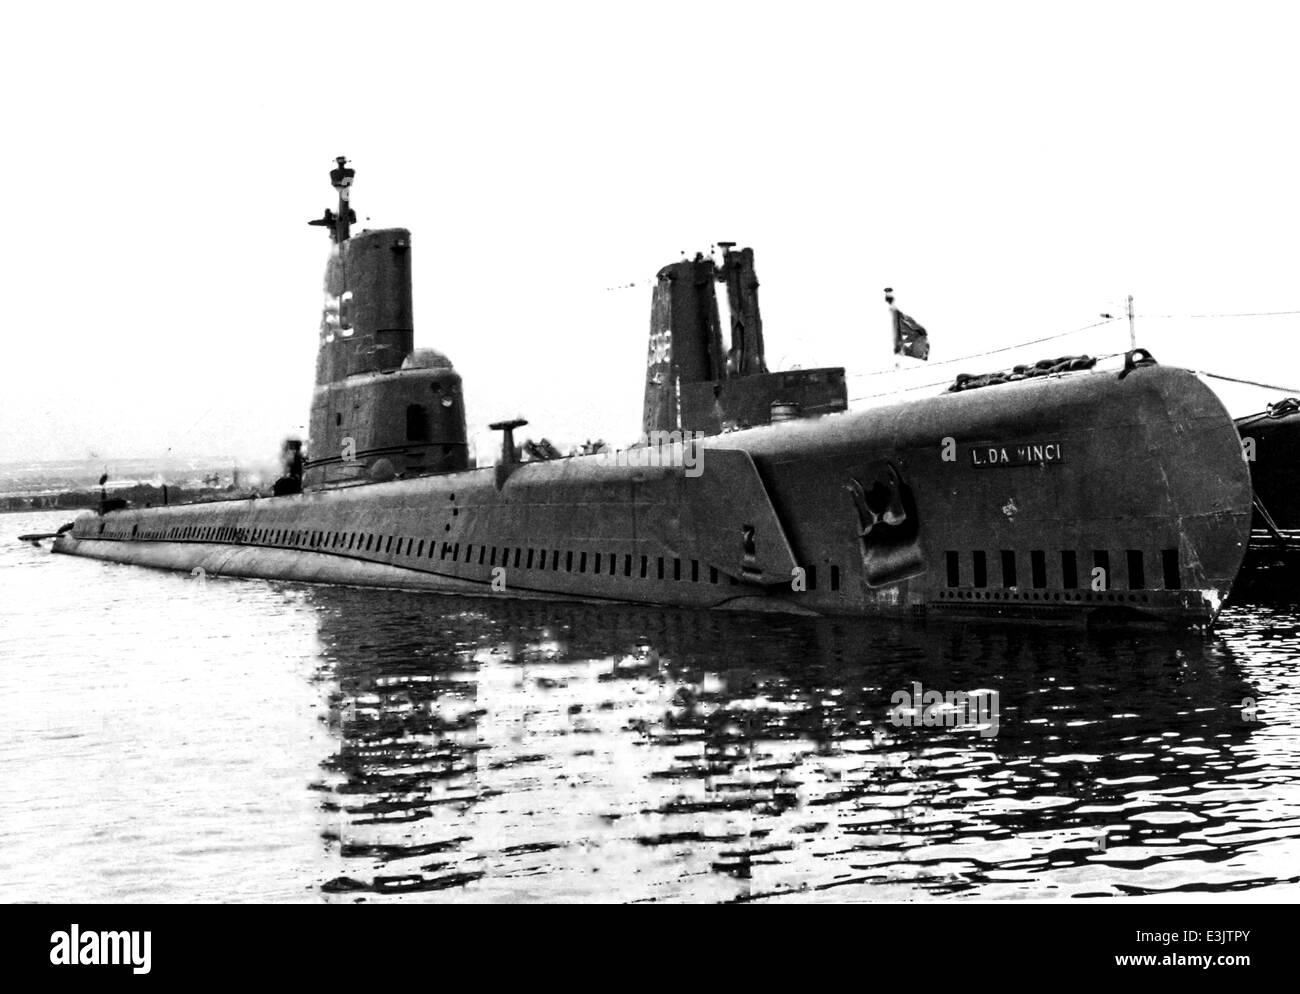 submersible 'leonardo da vinci' - Stock Image